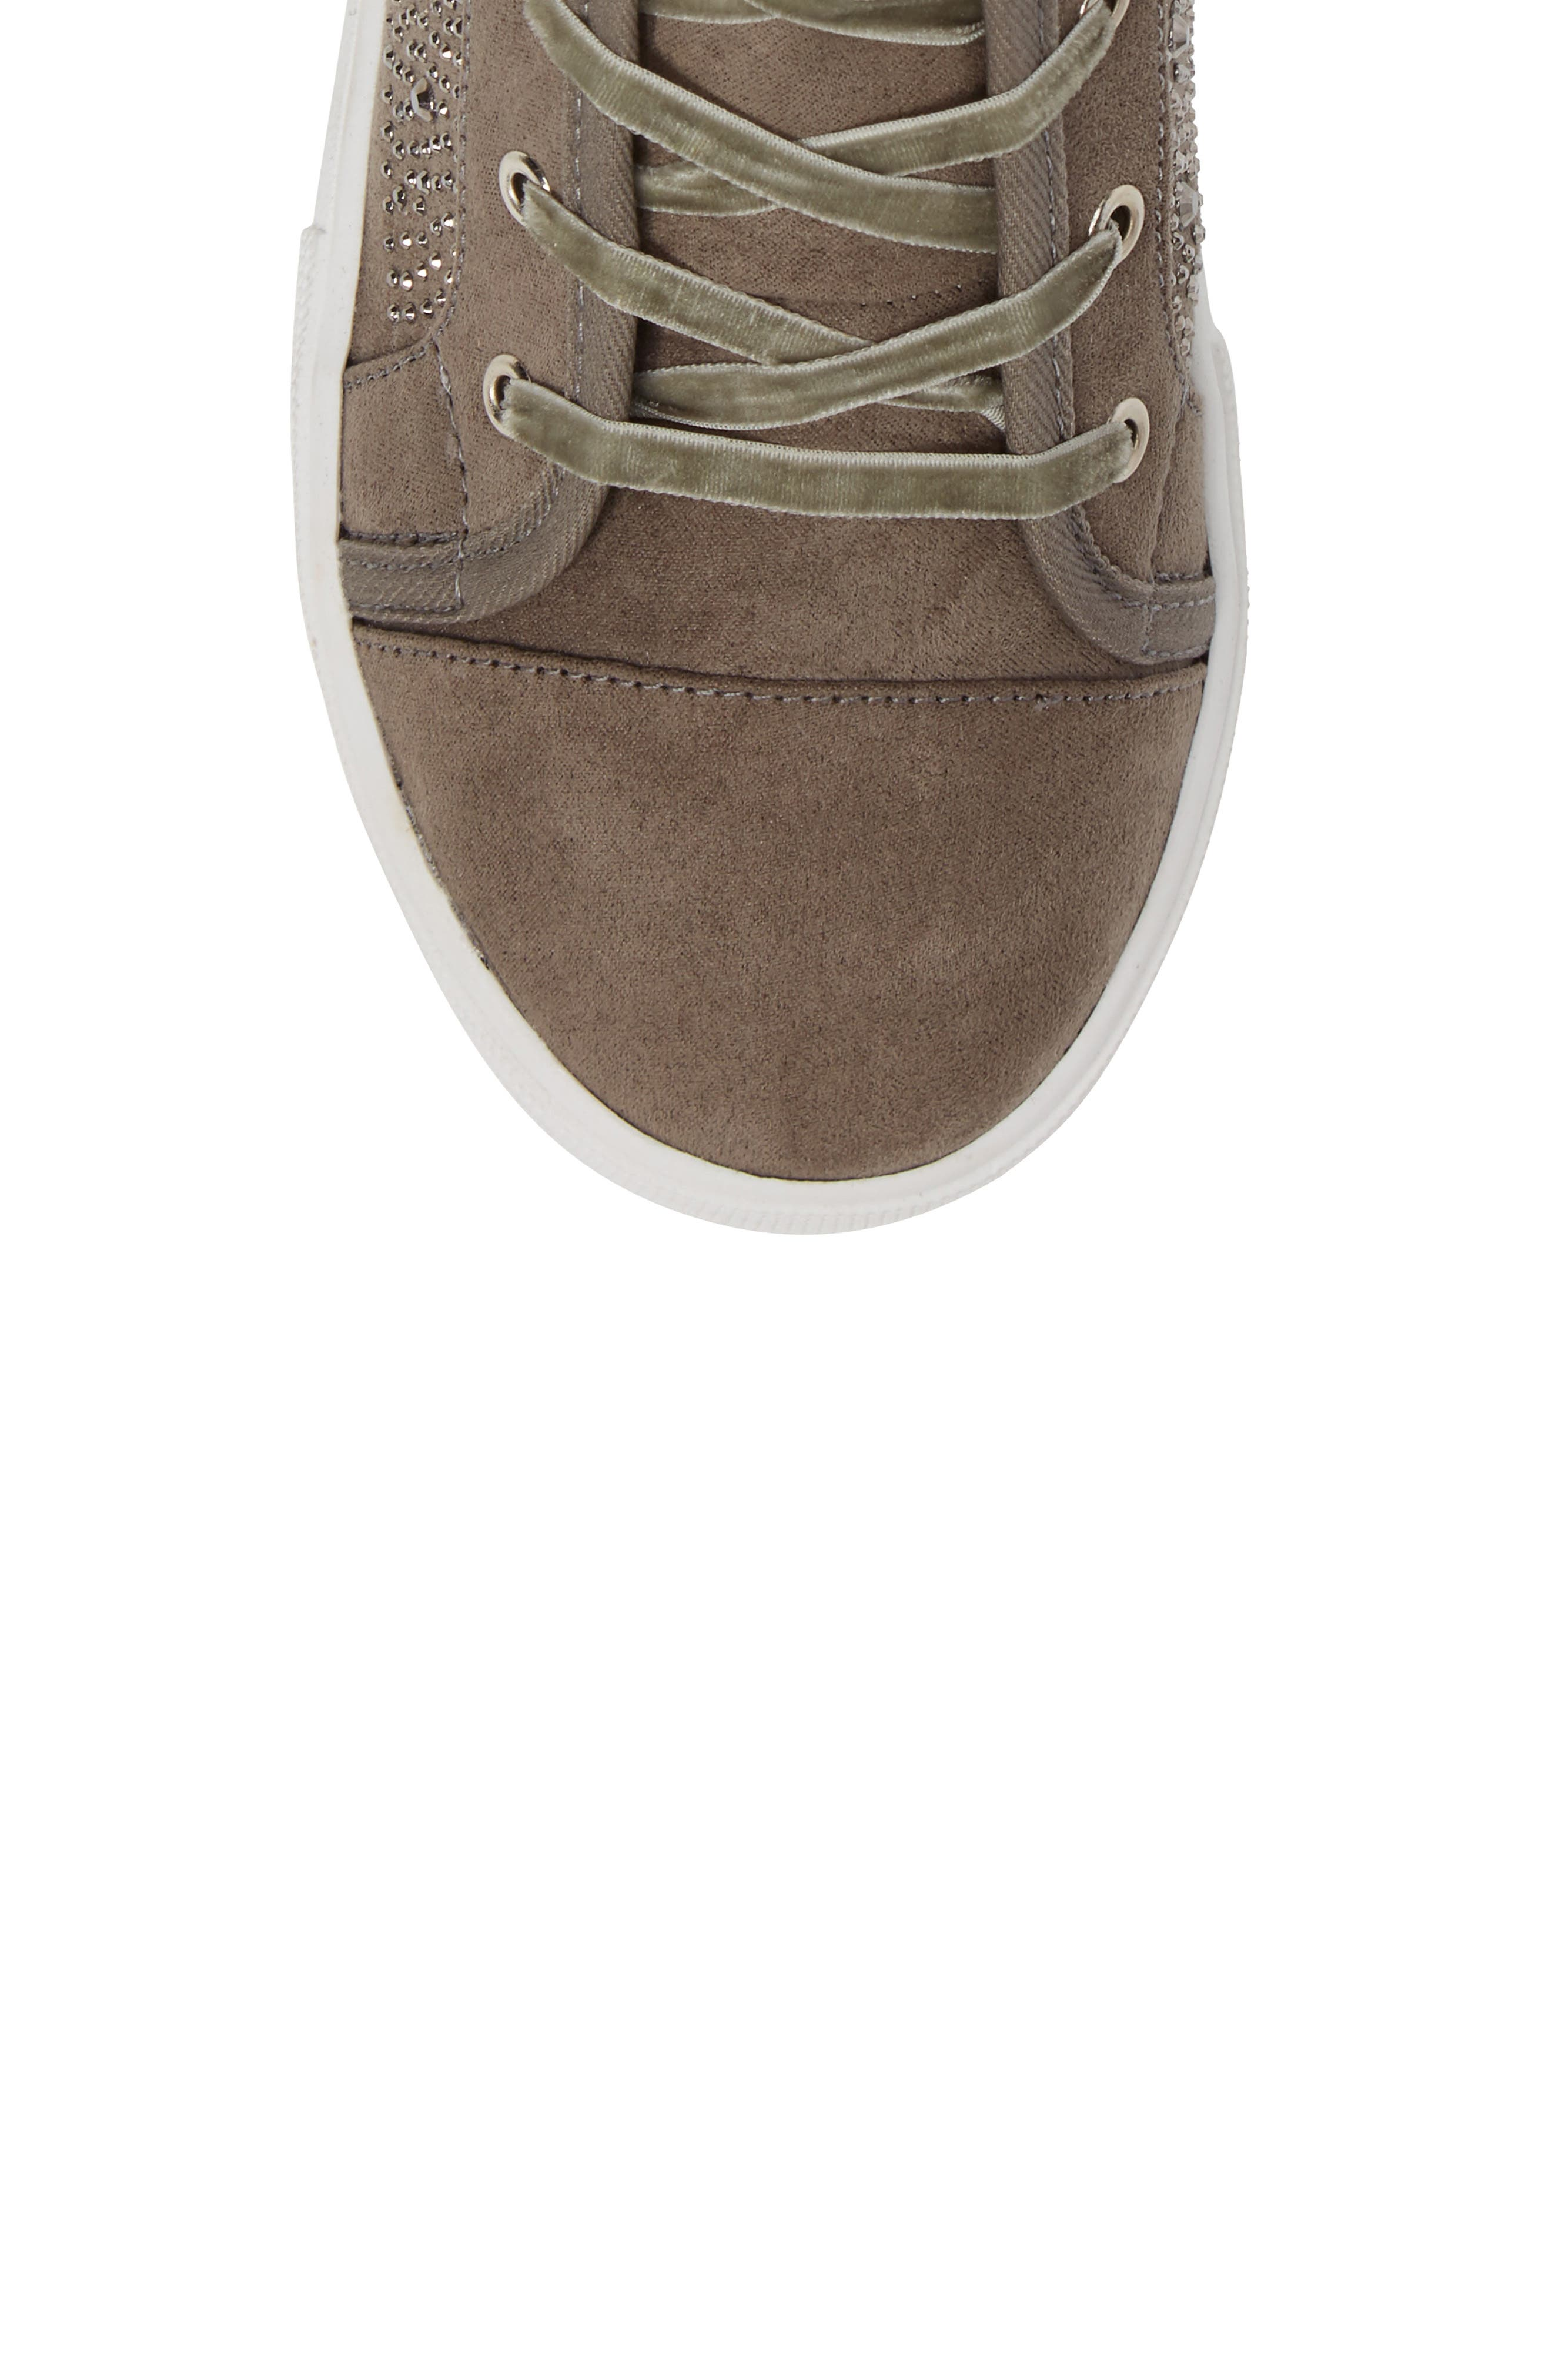 Vance Embellished High Top Sneaker,                             Alternate thumbnail 5, color,                             040